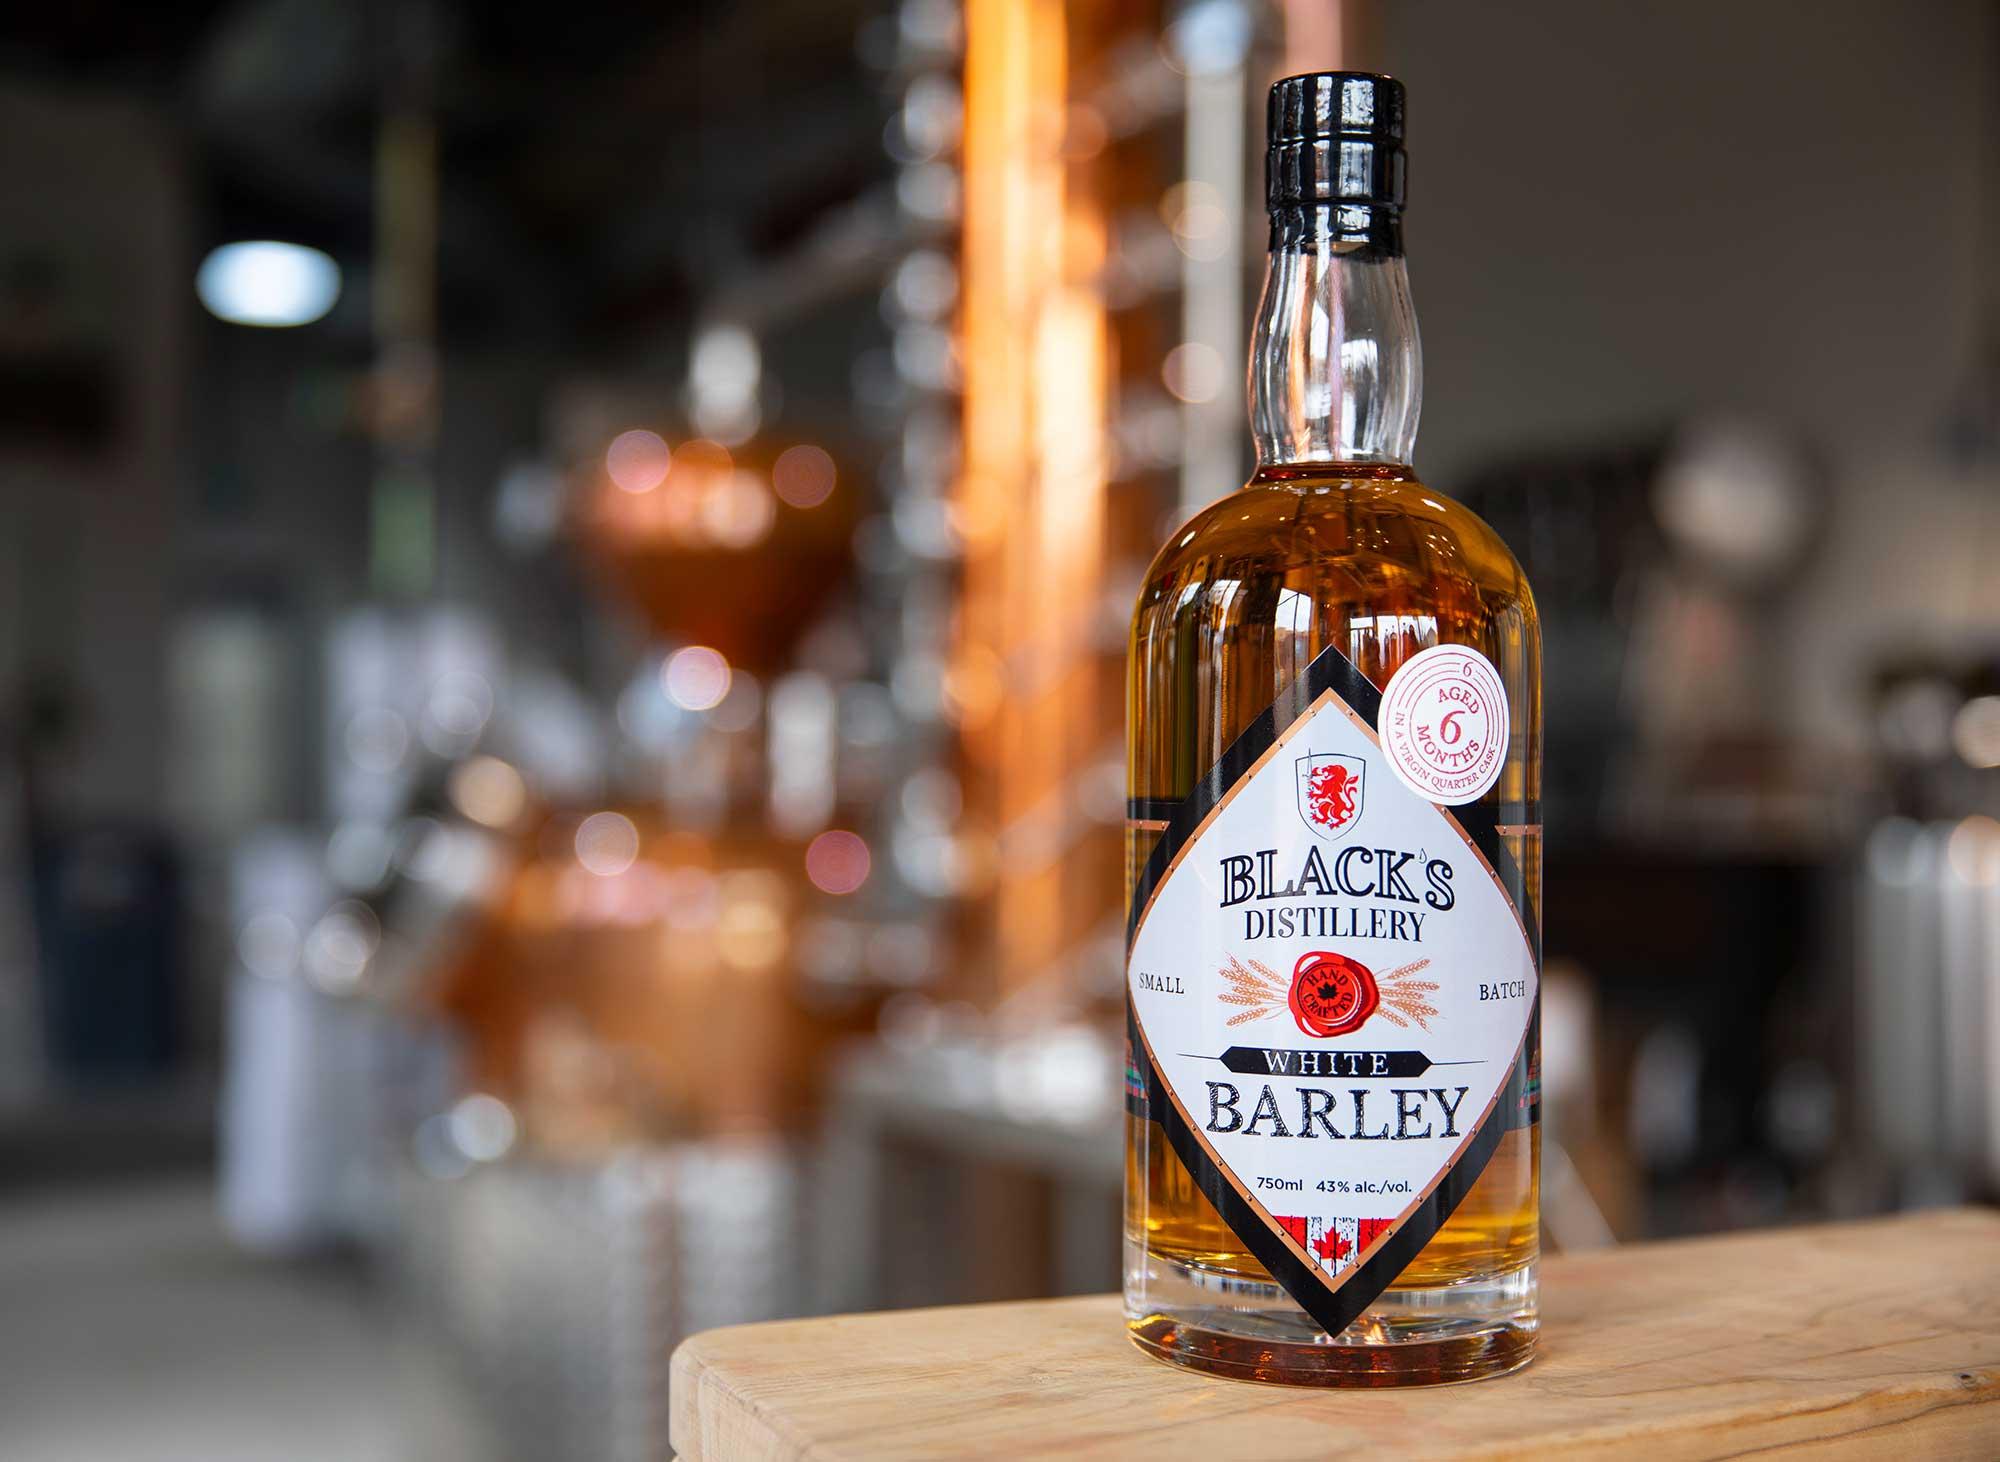 Black's Distillery Aged Barley